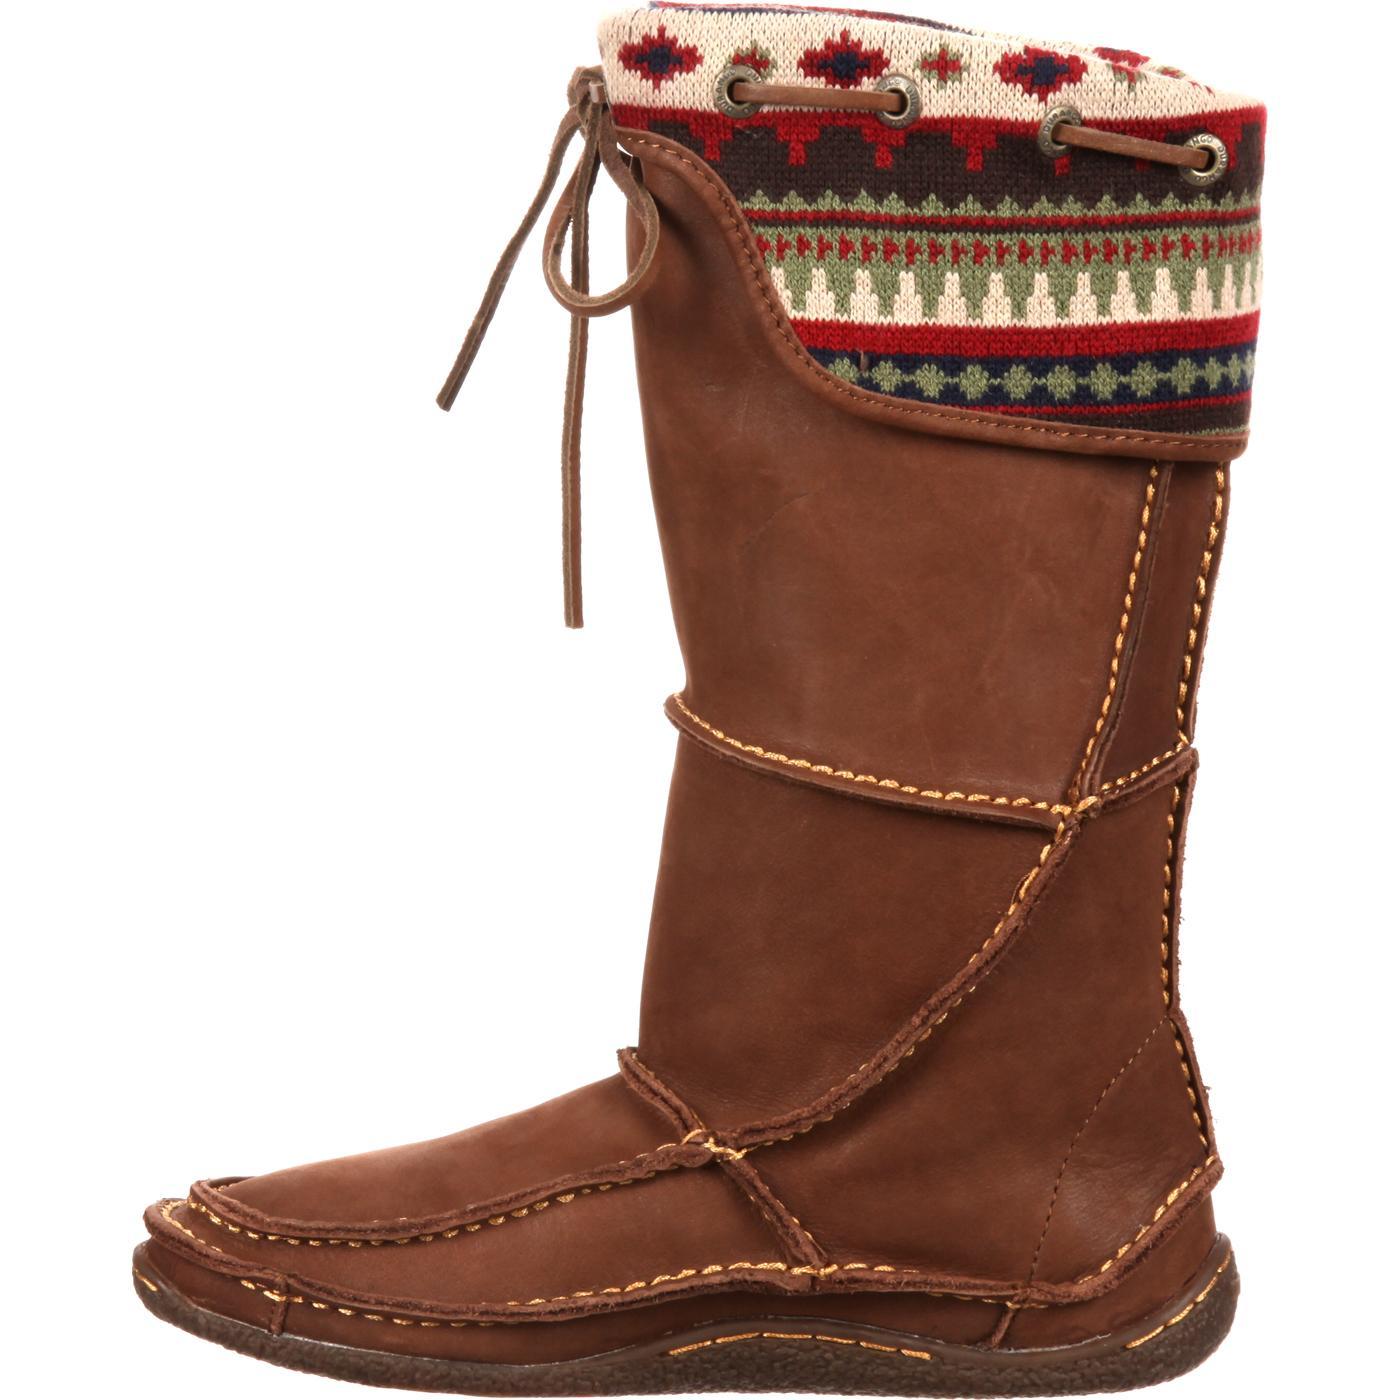 moccasin boots images poigwfm